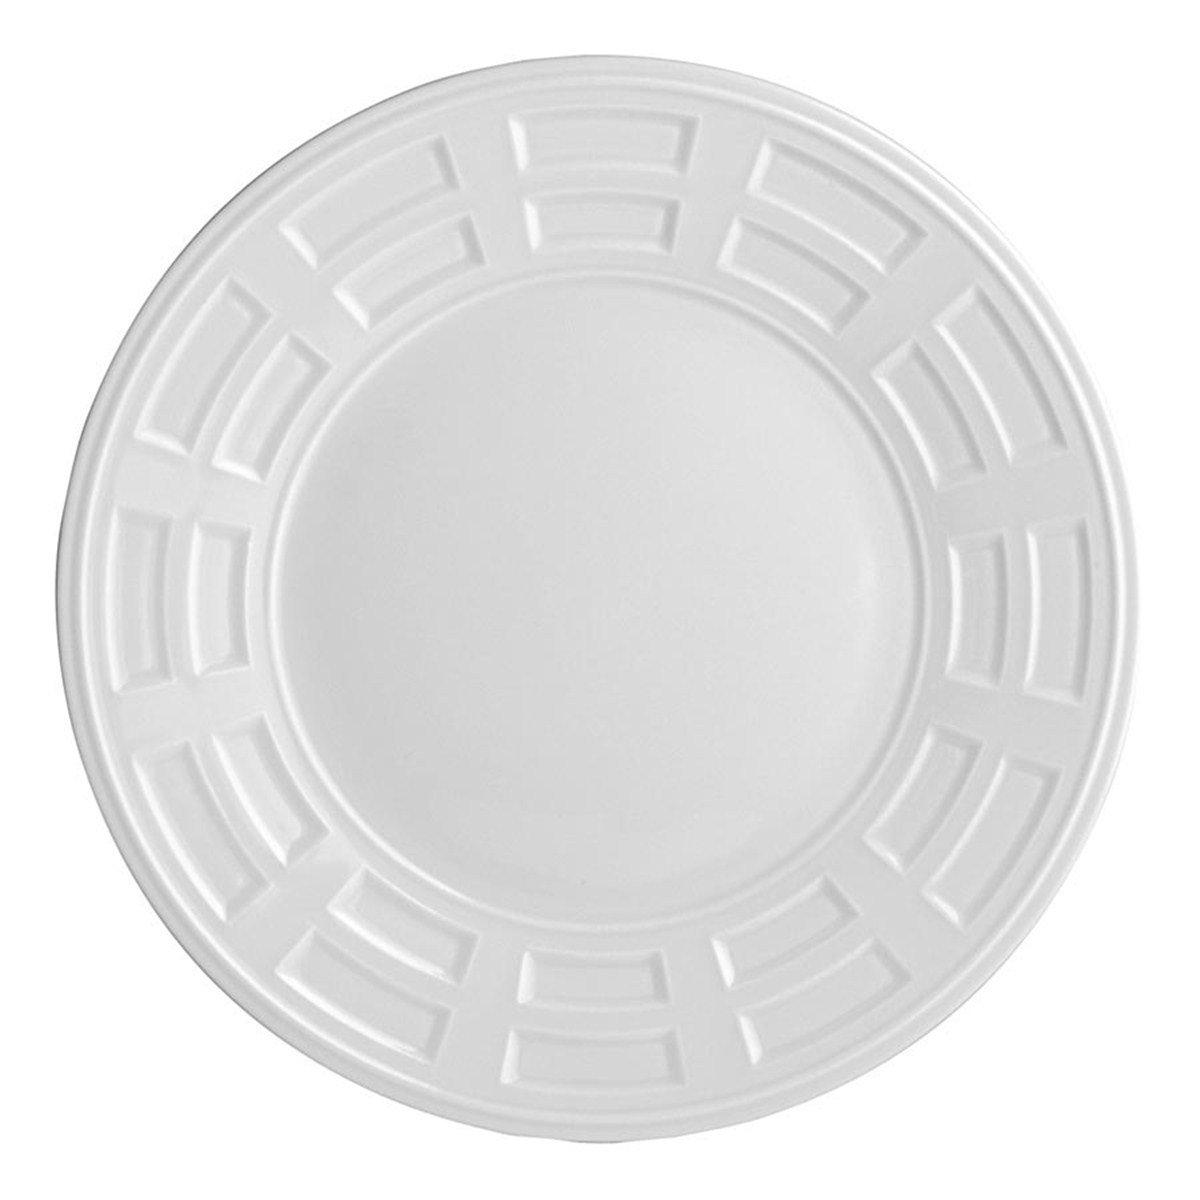 sc 1 st  Amazon.com & Amazon.com | Bernardaud Naxos Dinner Plate: Dinner Plates